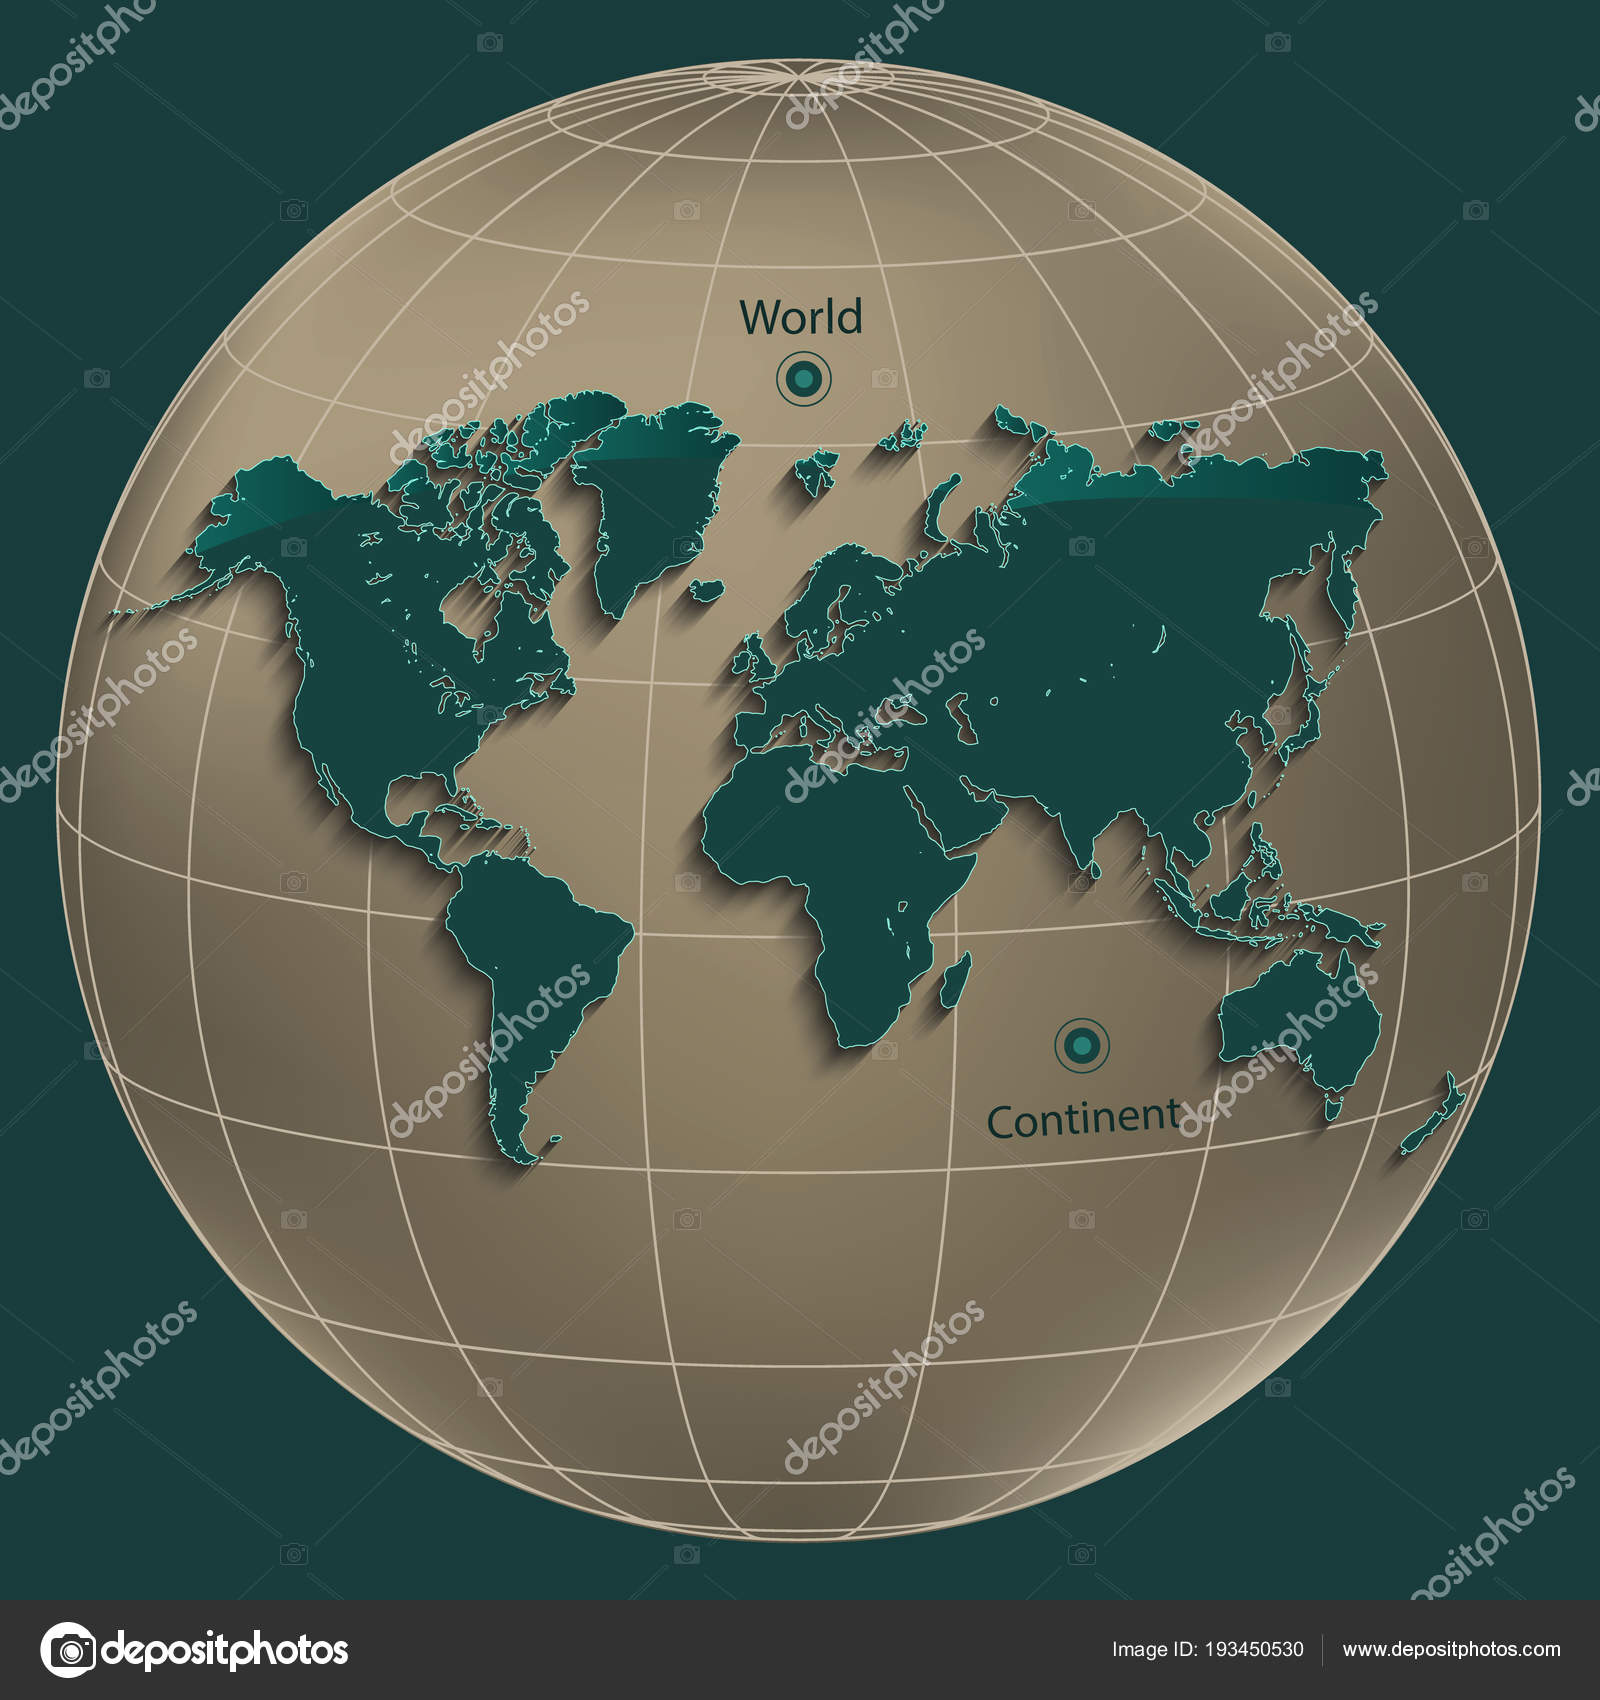 Karte Erde.Welt Karte Erde Gold Globe Erdöl Farbe Hintergrund Vektor